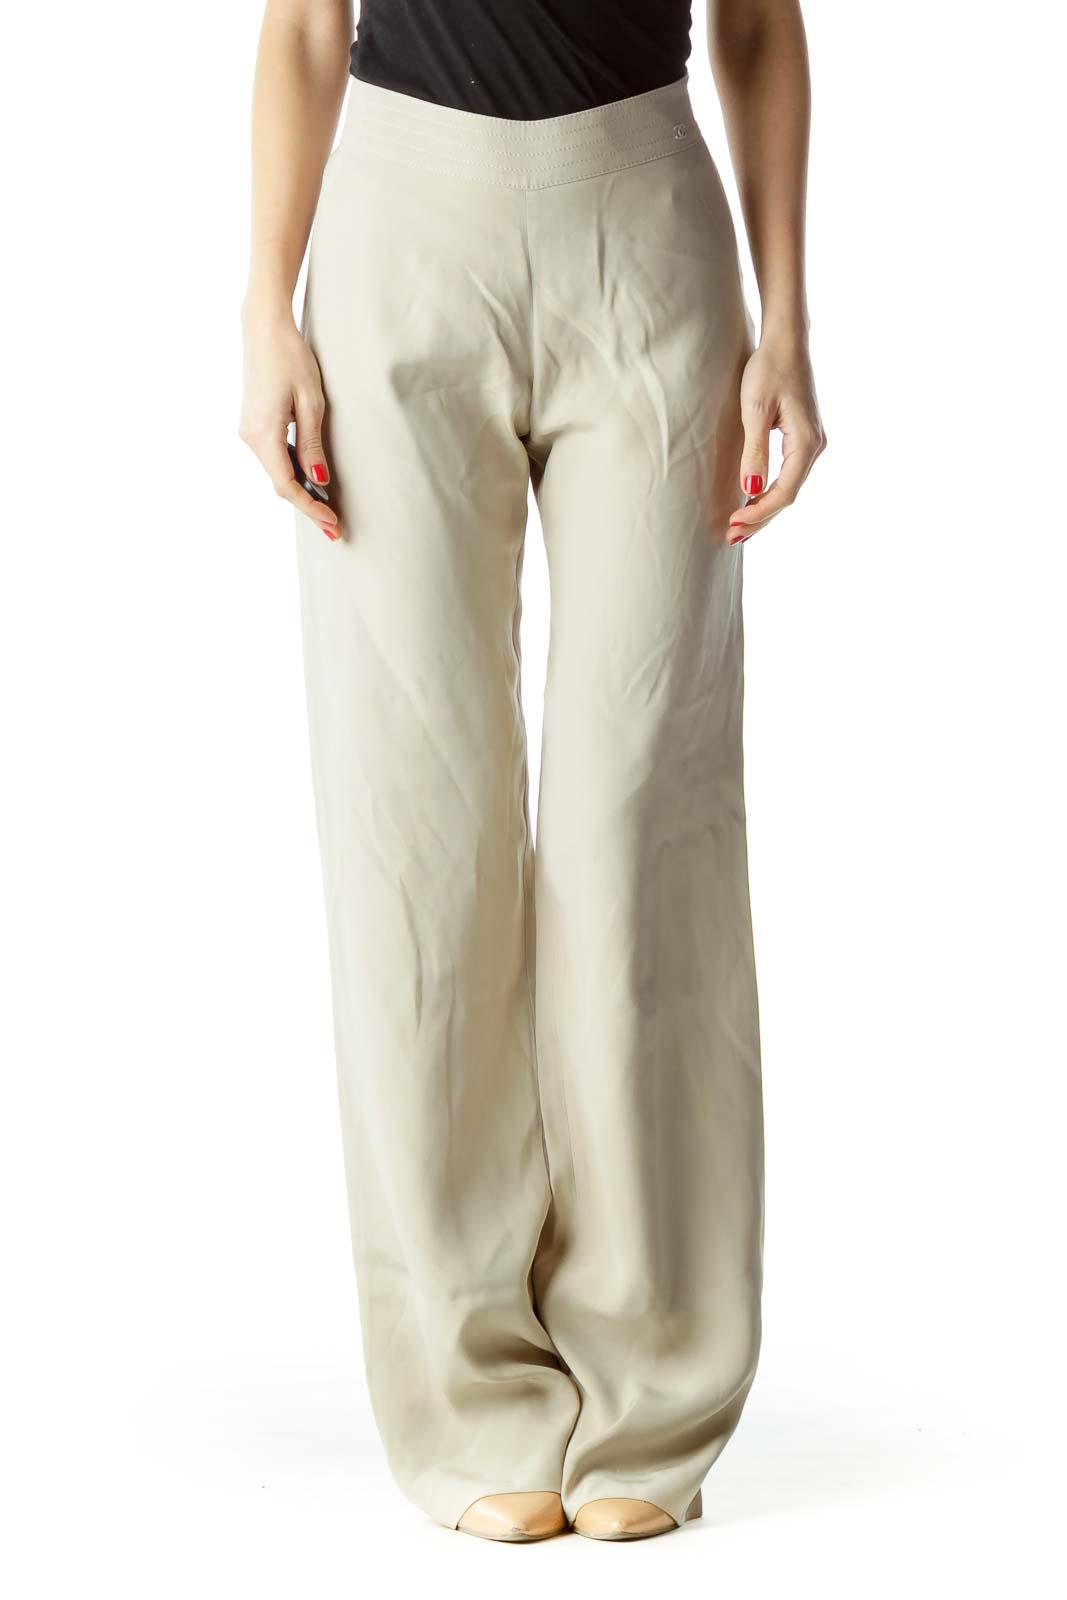 Gray 100% Silk Designer High-Waisted Pants (Altered)